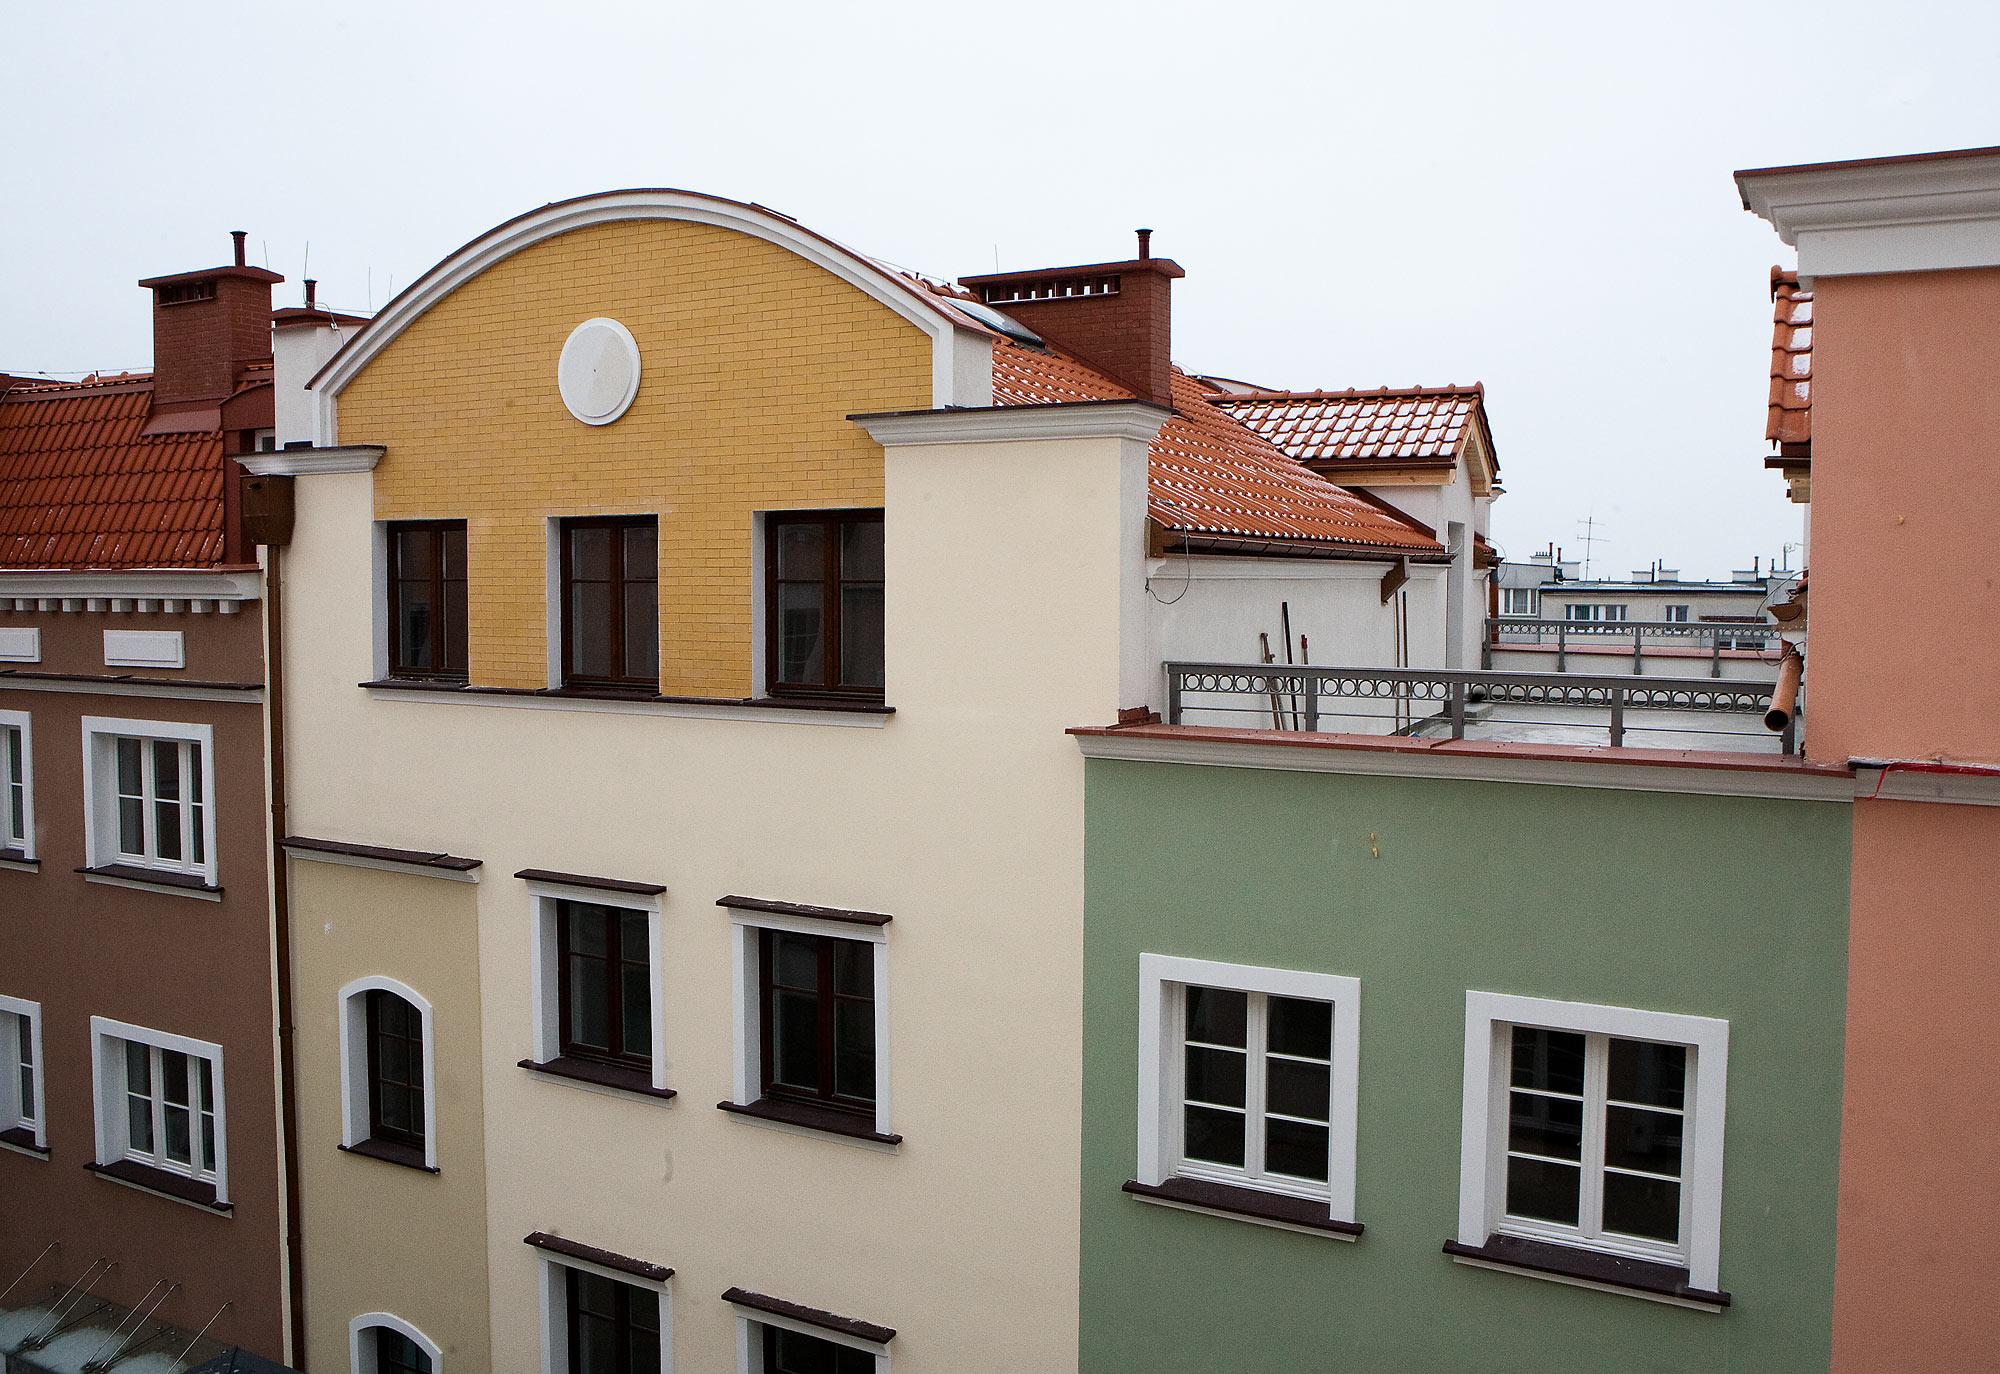 20110202 Stare Miasto Mieszkania 2054 duze f7